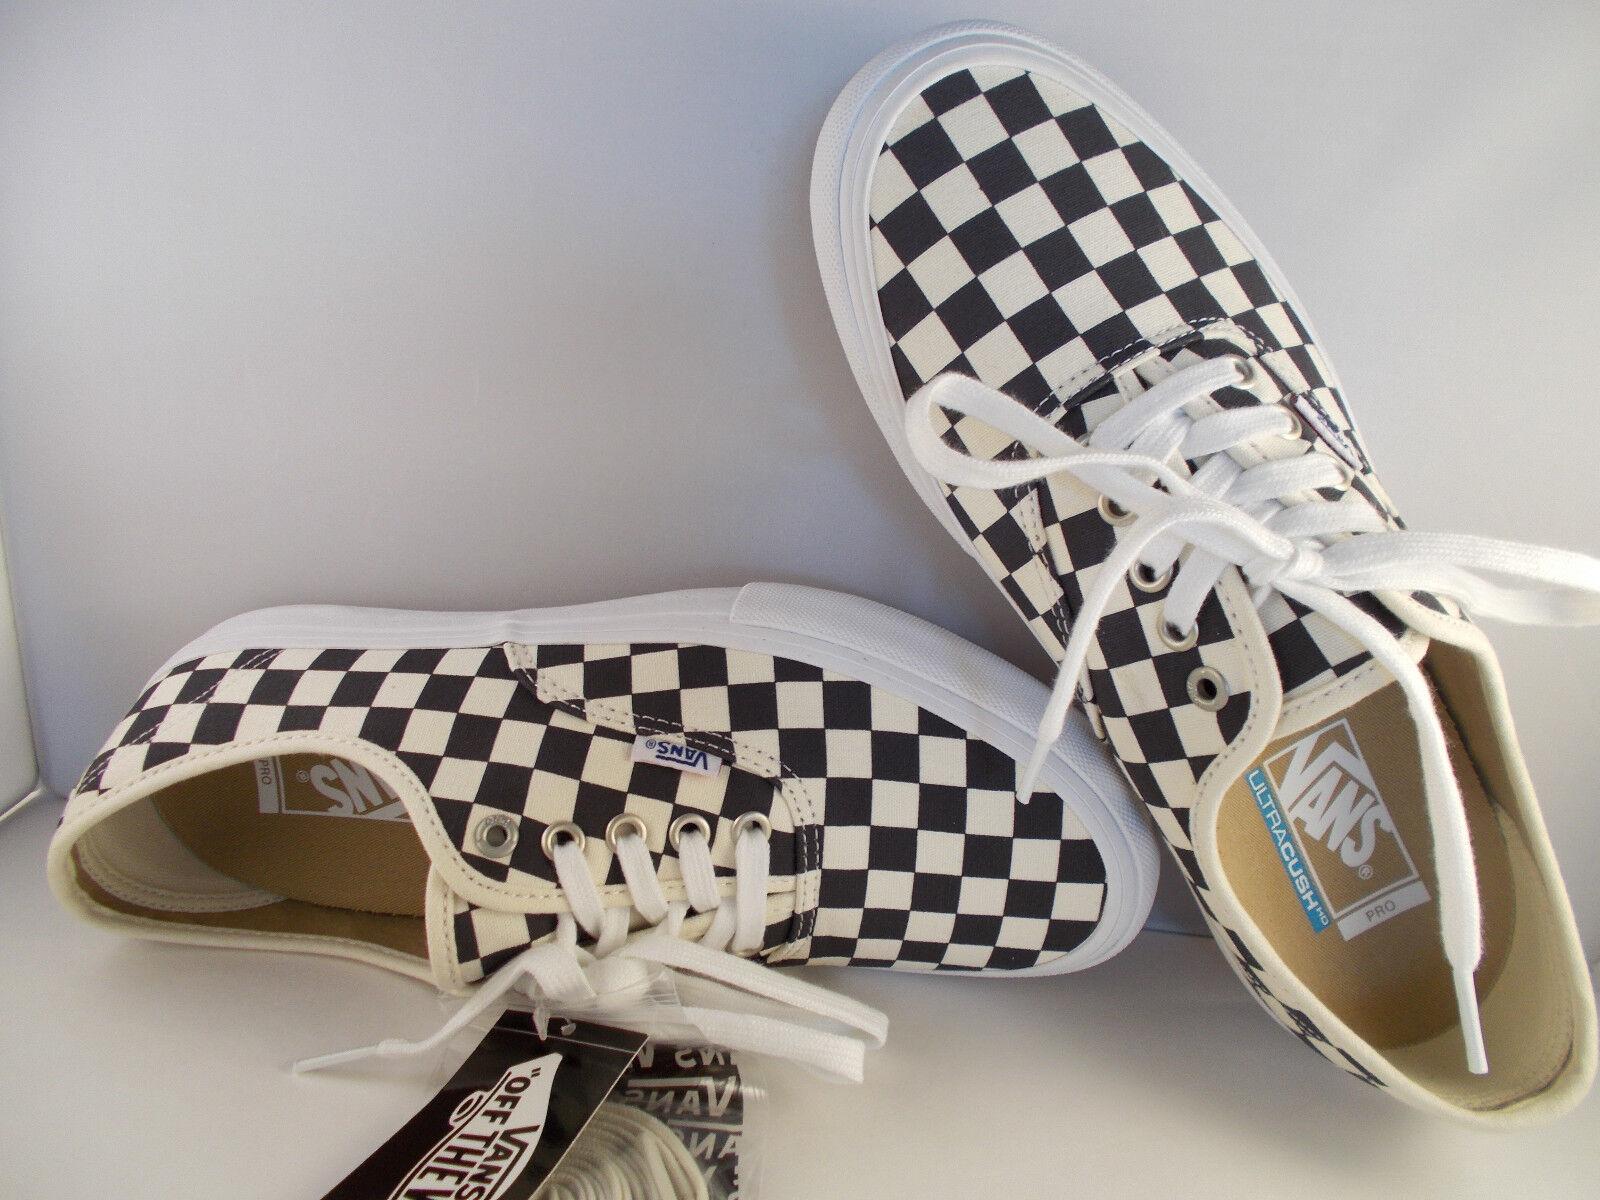 VANS Authentic Pro Checkerboard Navy UltraCush Skateboarding Shoe uomo Sz 6.5 NIB Scarpe classiche da uomo